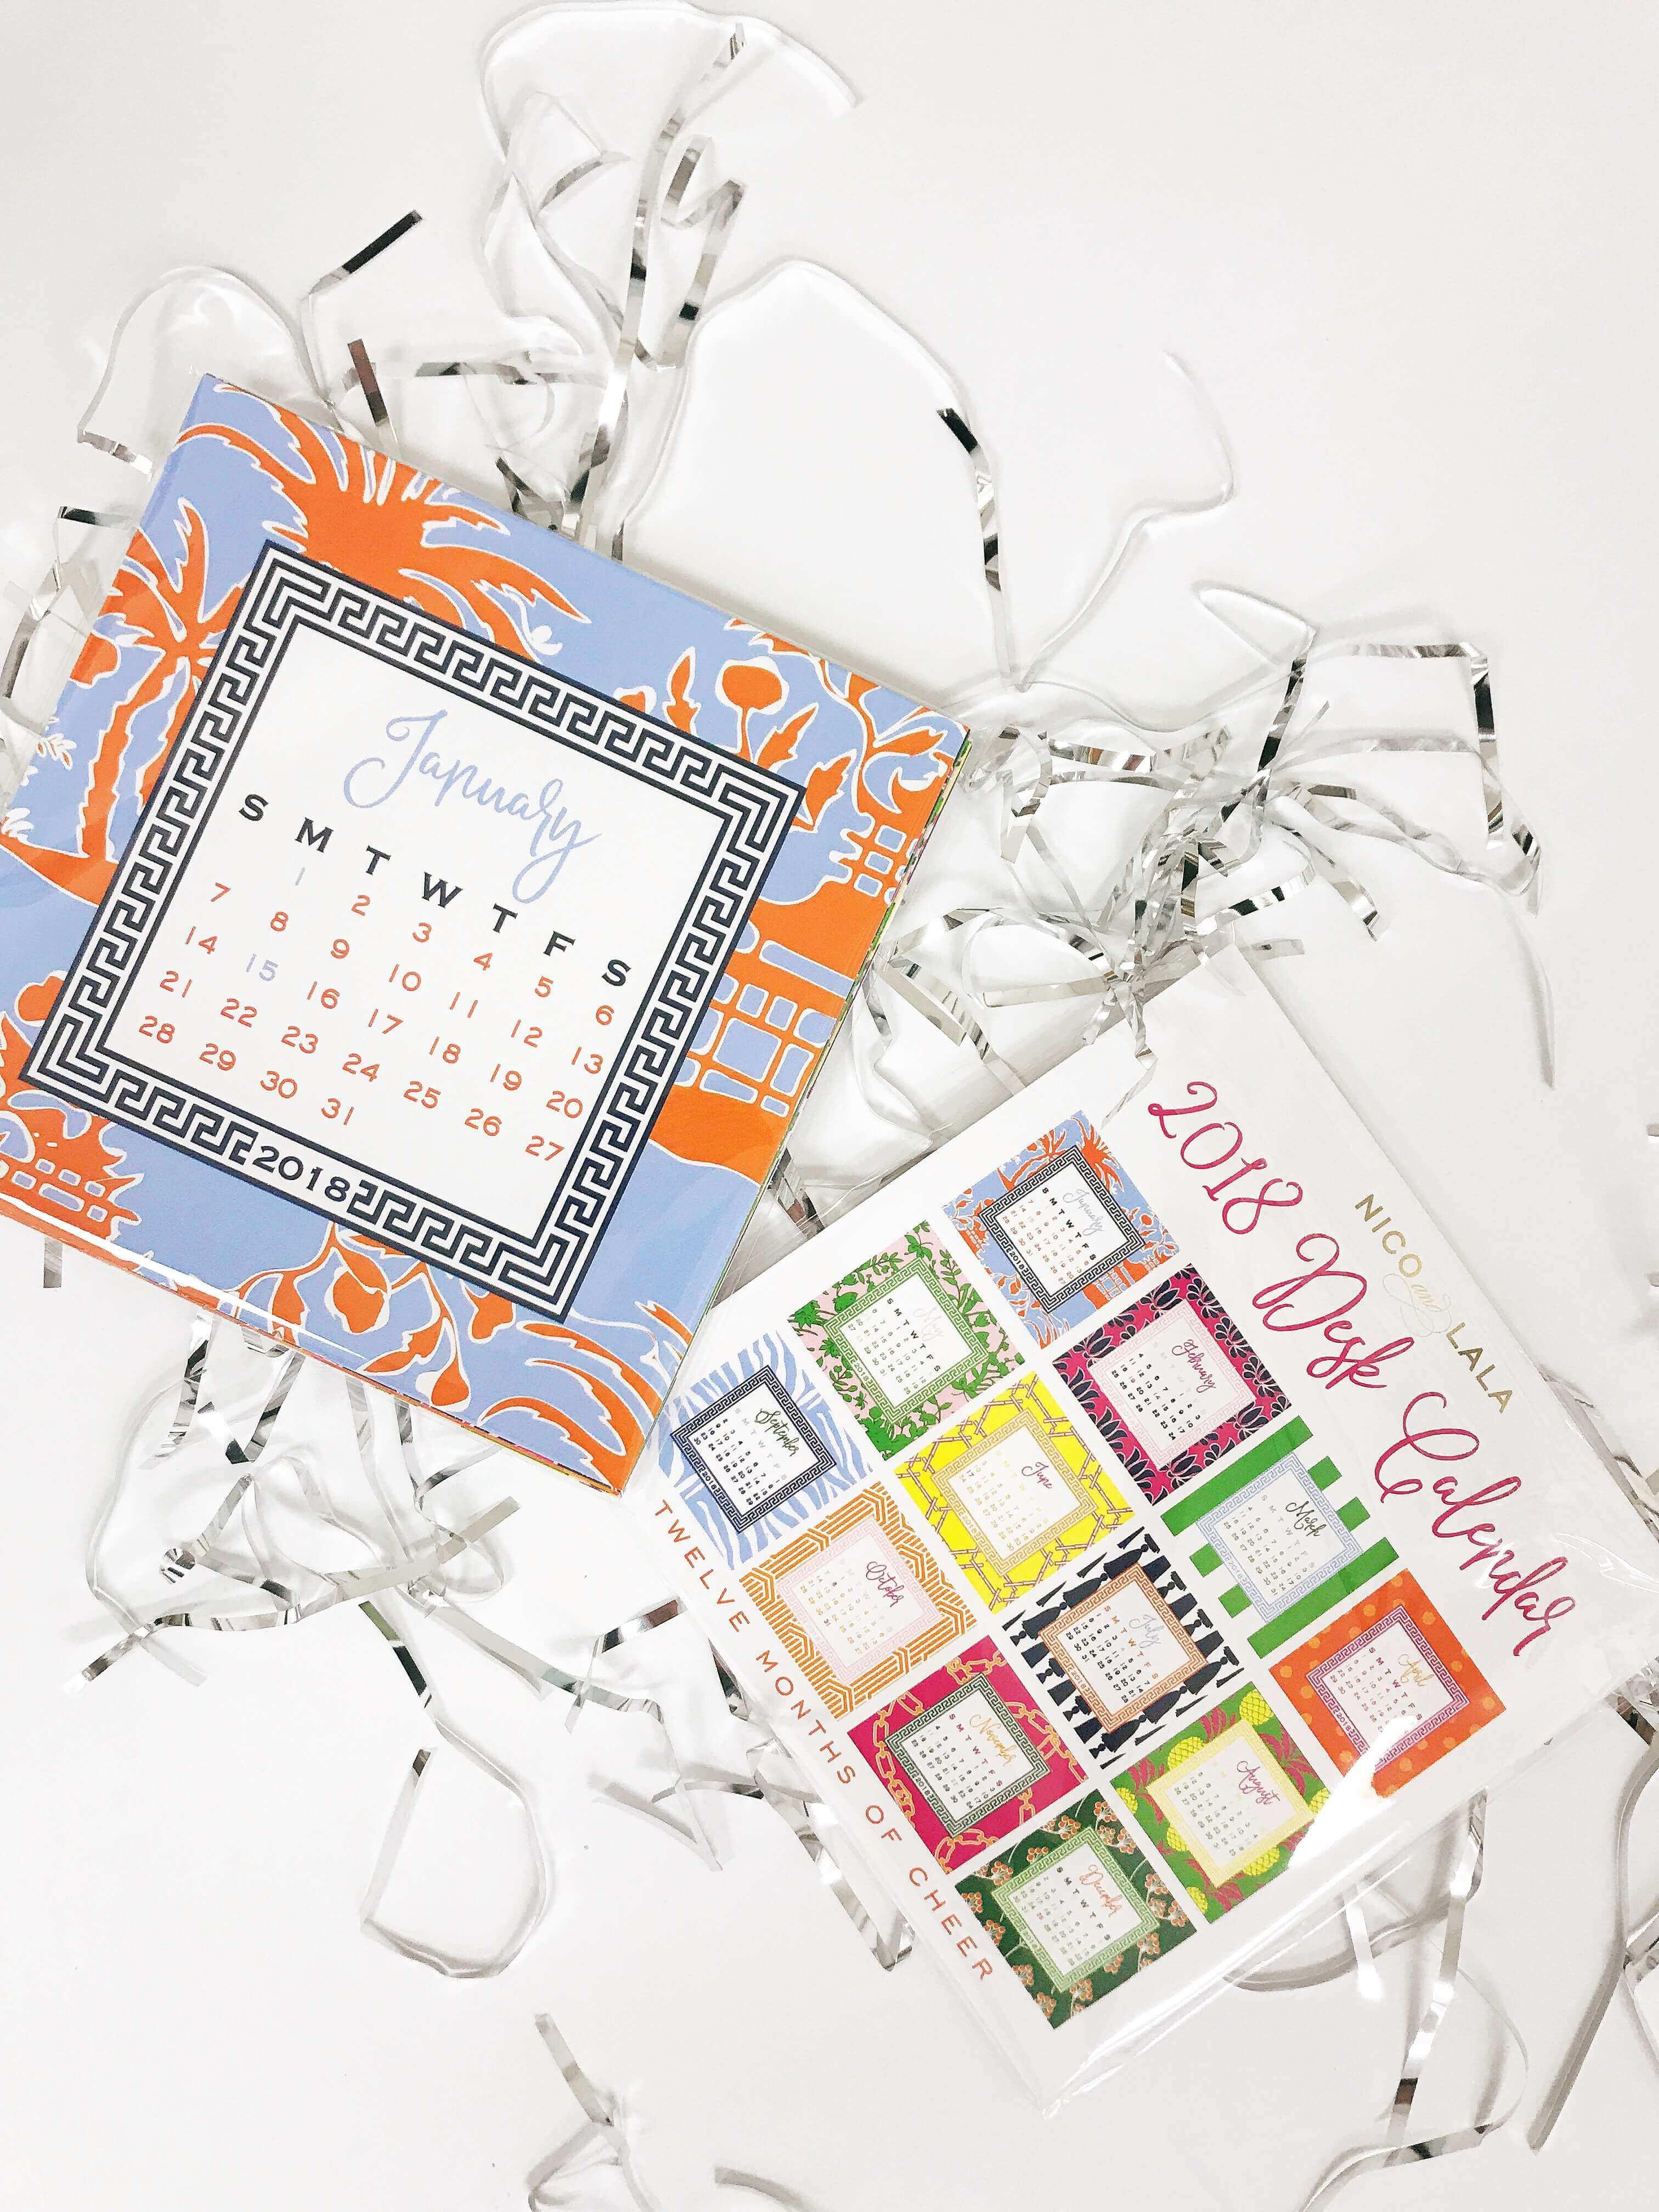 2018 Nico and Lala Desk Calendar